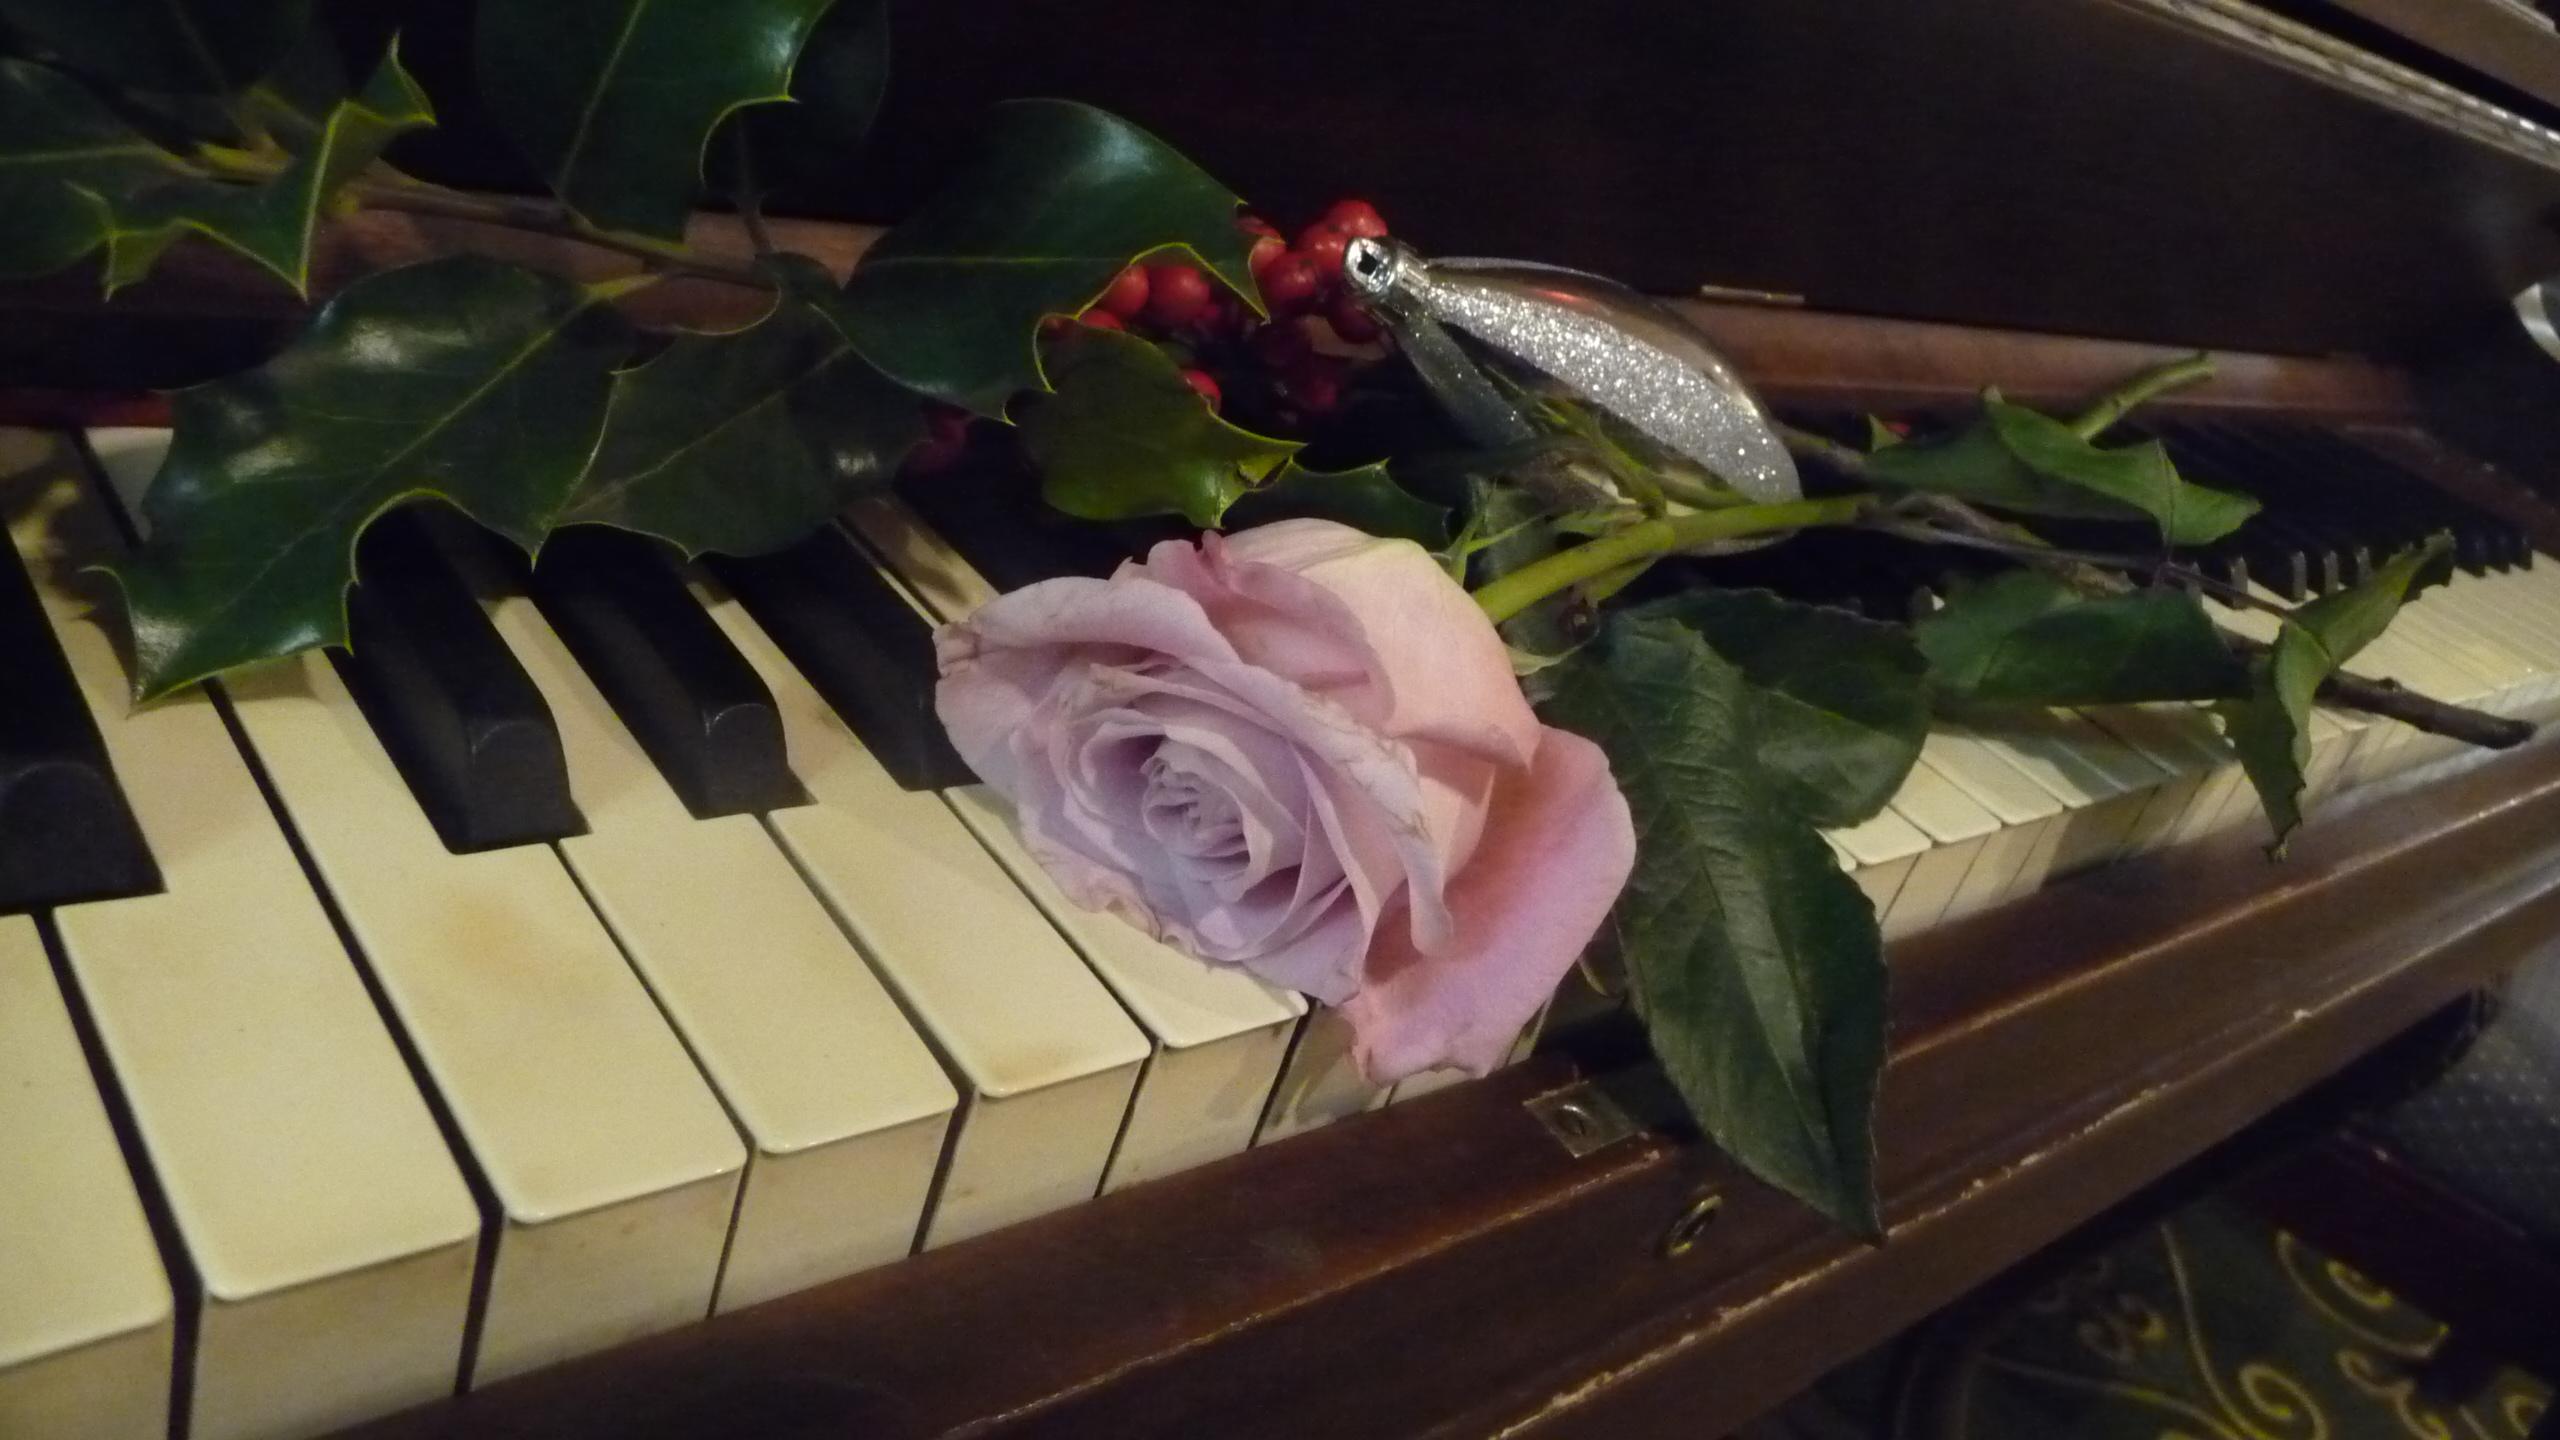 Картинки тортиками, картинка с клавишами и цветами